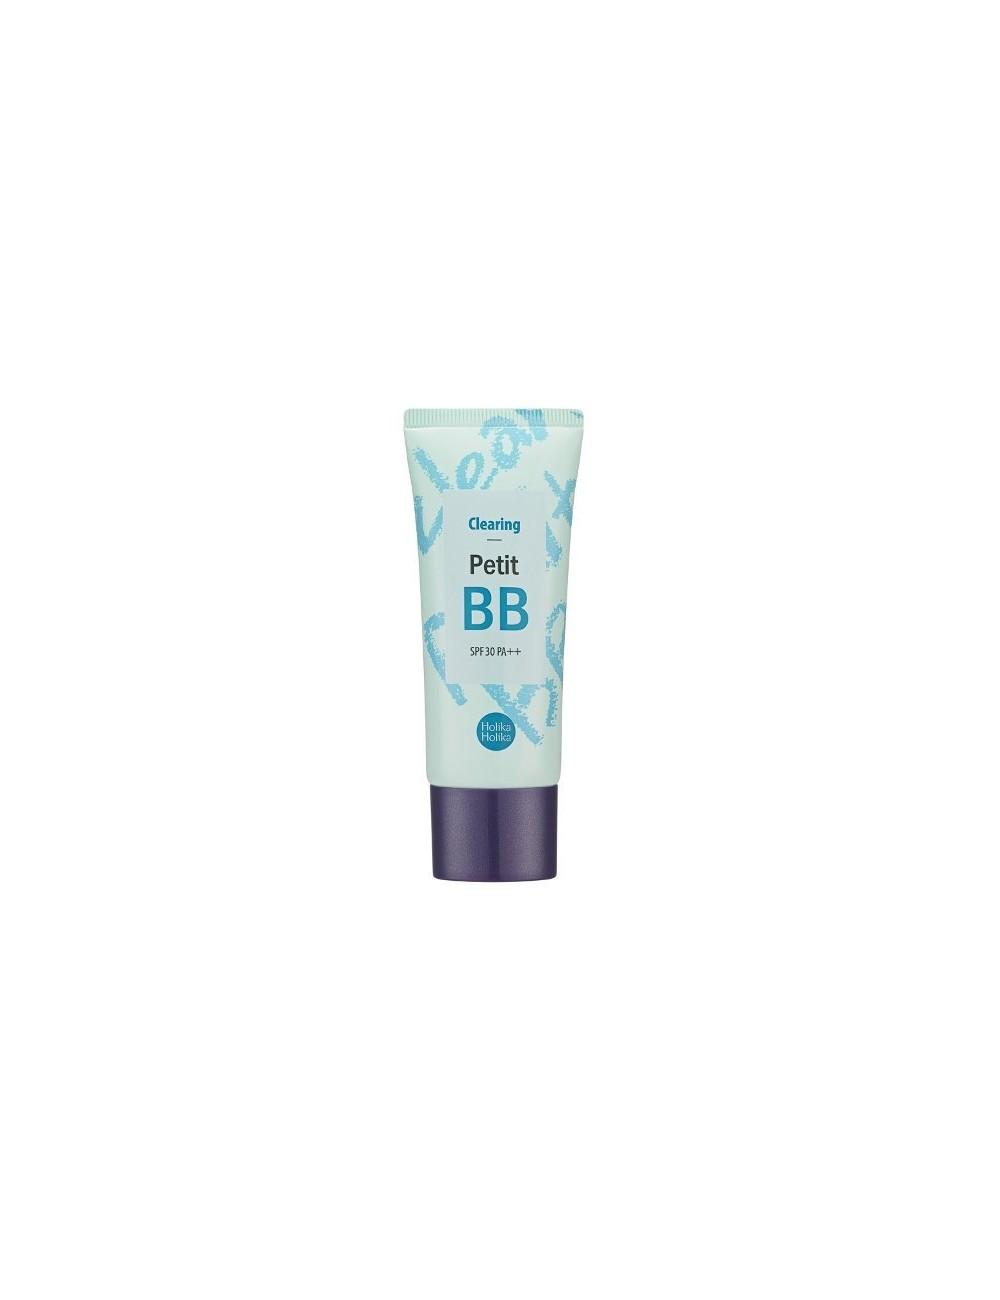 Holika Holika BB Cream Clearing Petit BB SPF 30 PA++